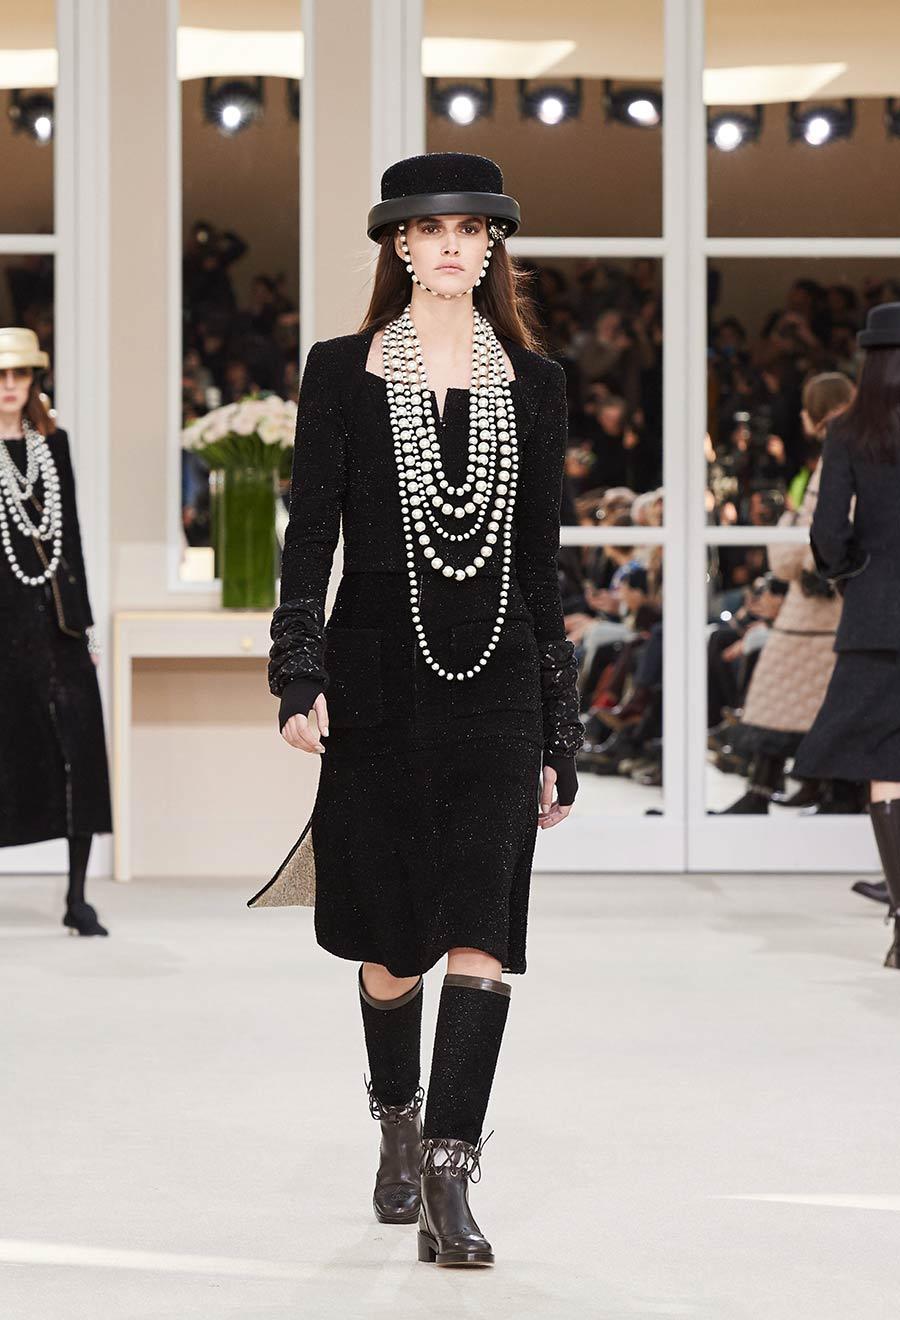 Little Black dress - Chanel sfilata